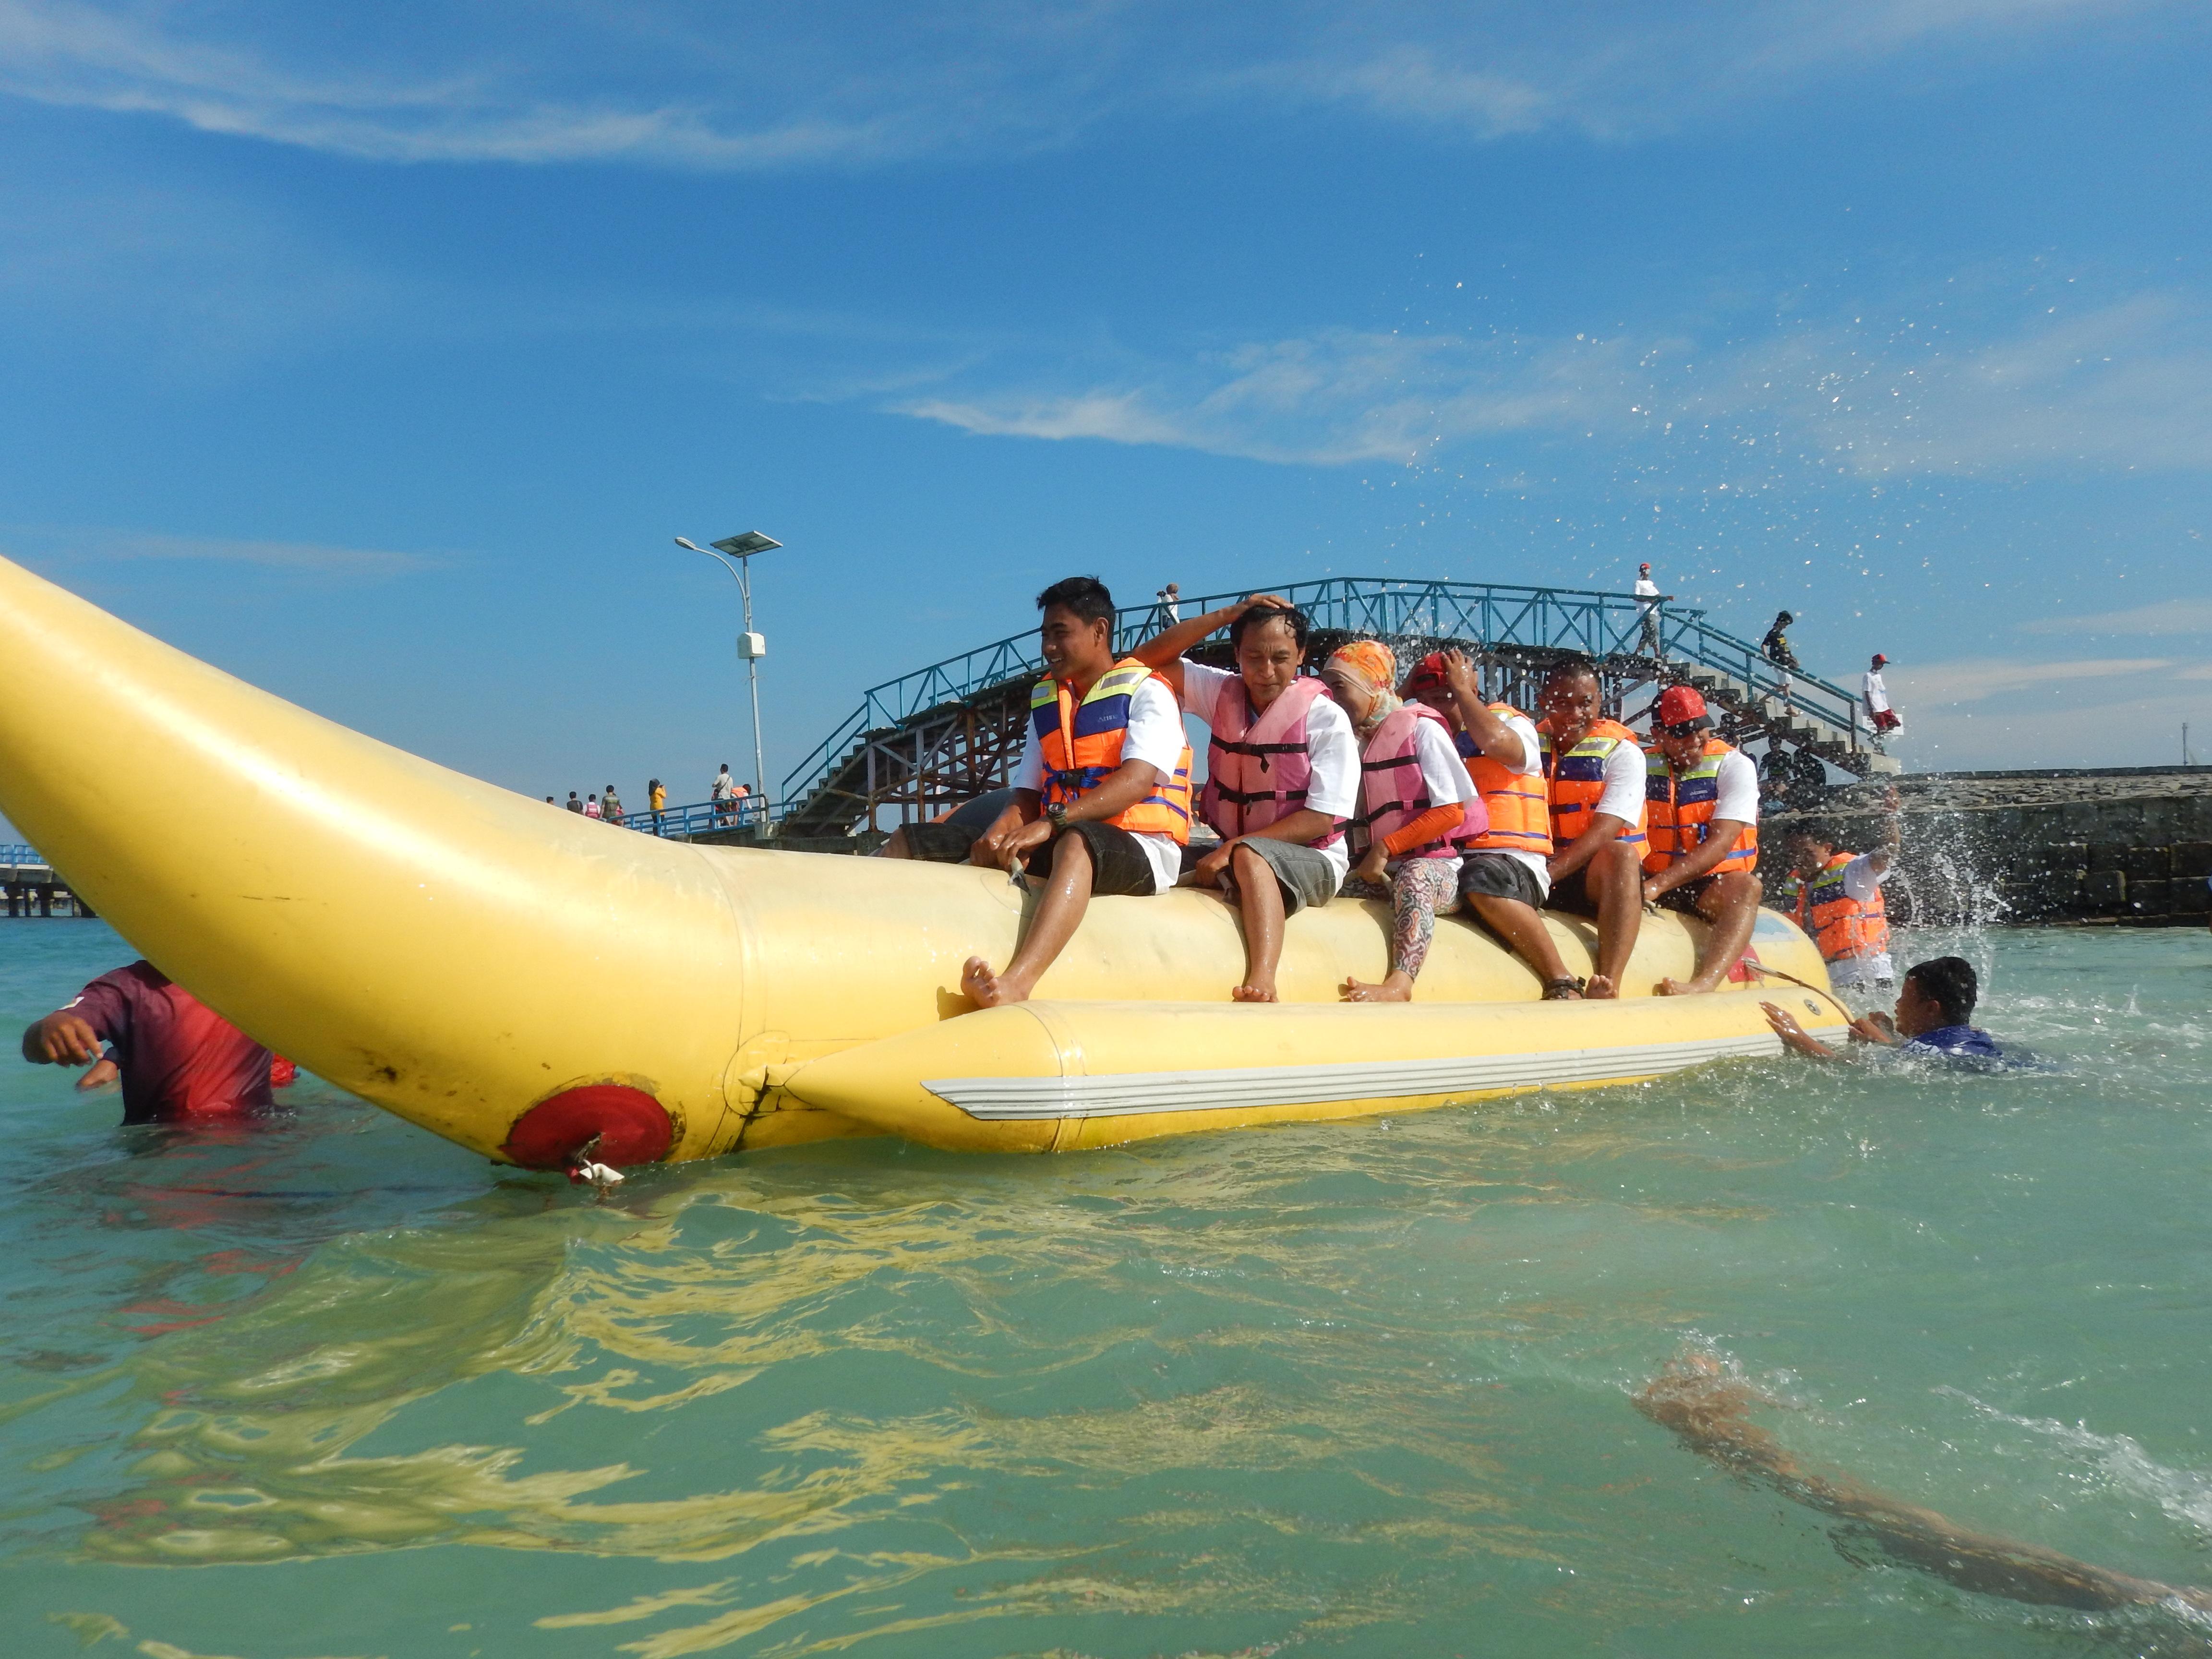 Pulau Tidung Sheila Tour Wisata Harga Promo Murah Paket 2021